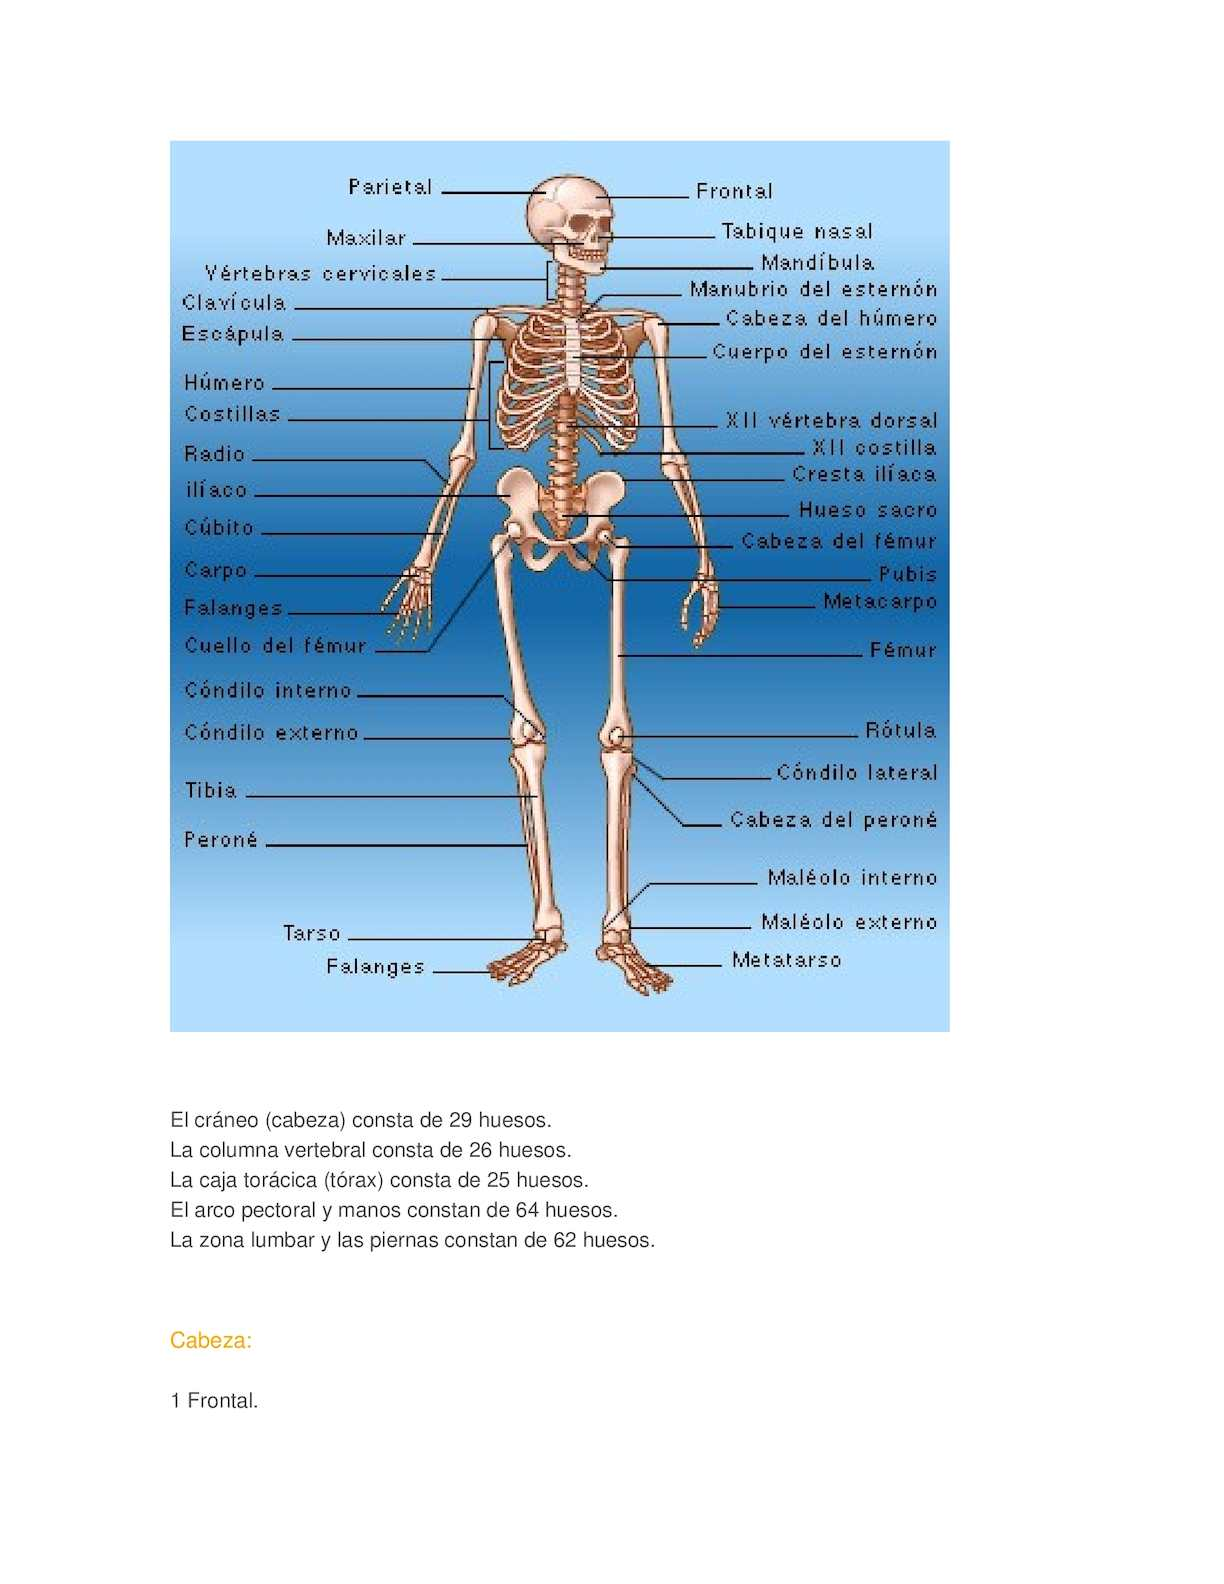 Moderno Dork Anatomía Ballena Ideas - Imágenes de Anatomía Humana ...